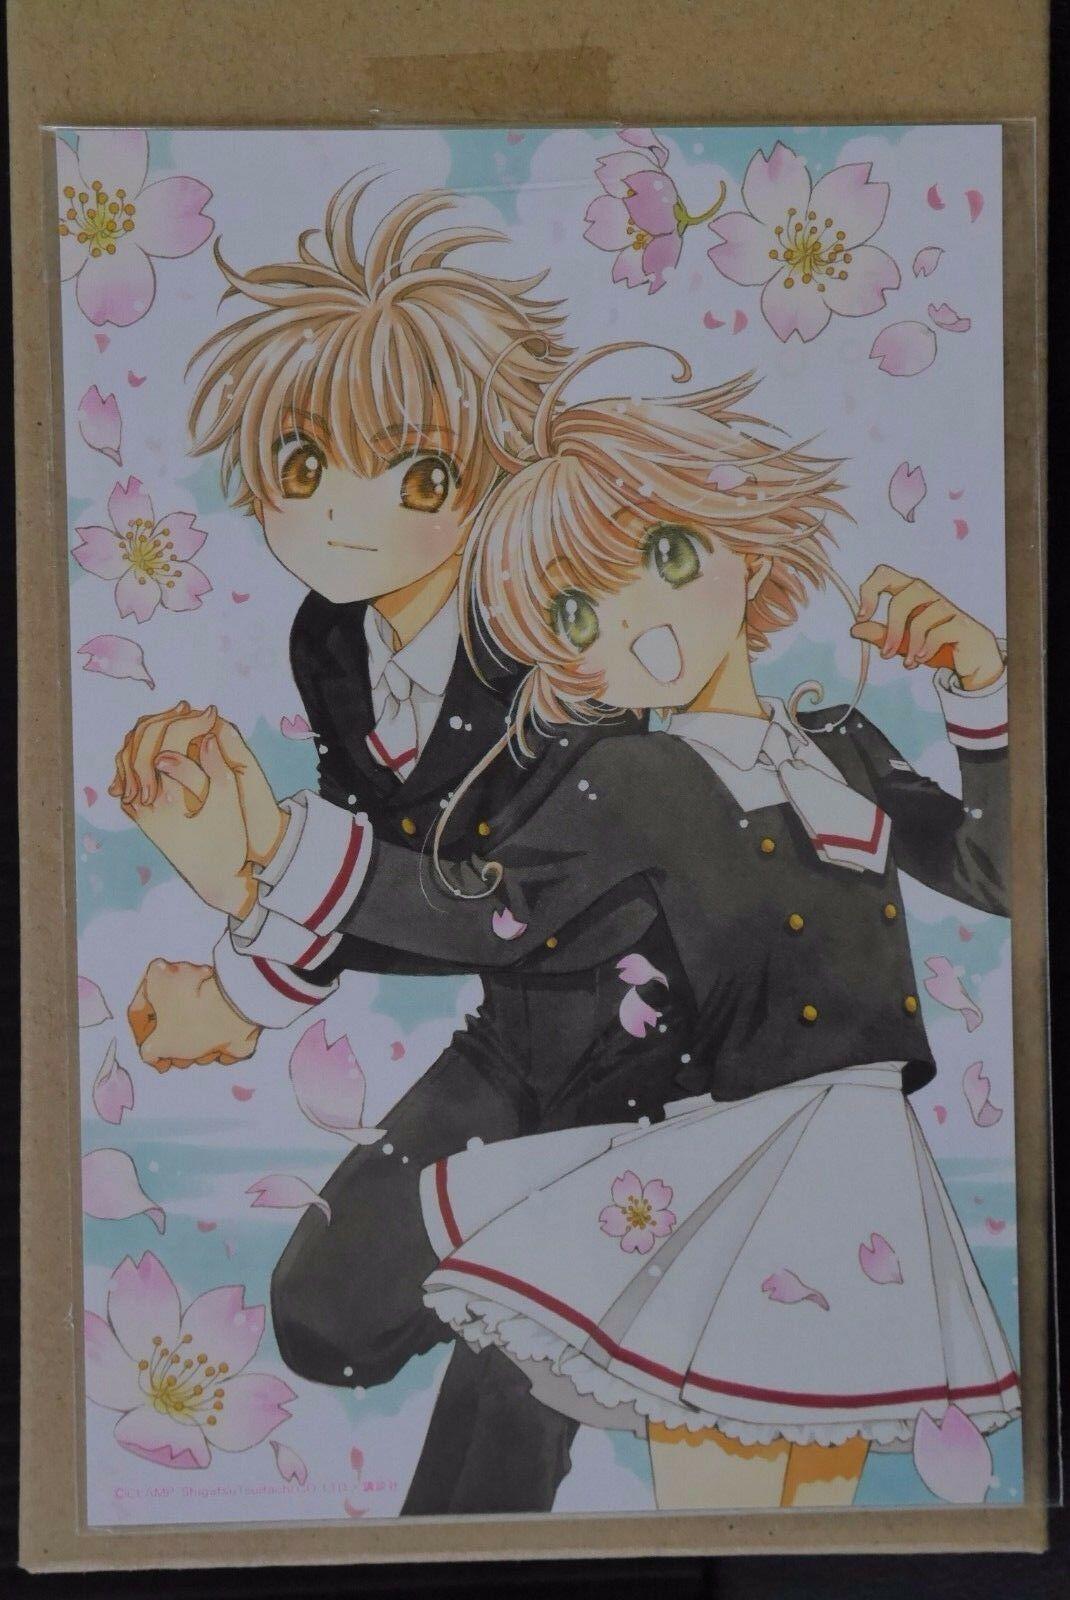 JAPAN Clamp manga: Cardcaptor Sakura -Clear Card Arc- vol.2 Special Edition